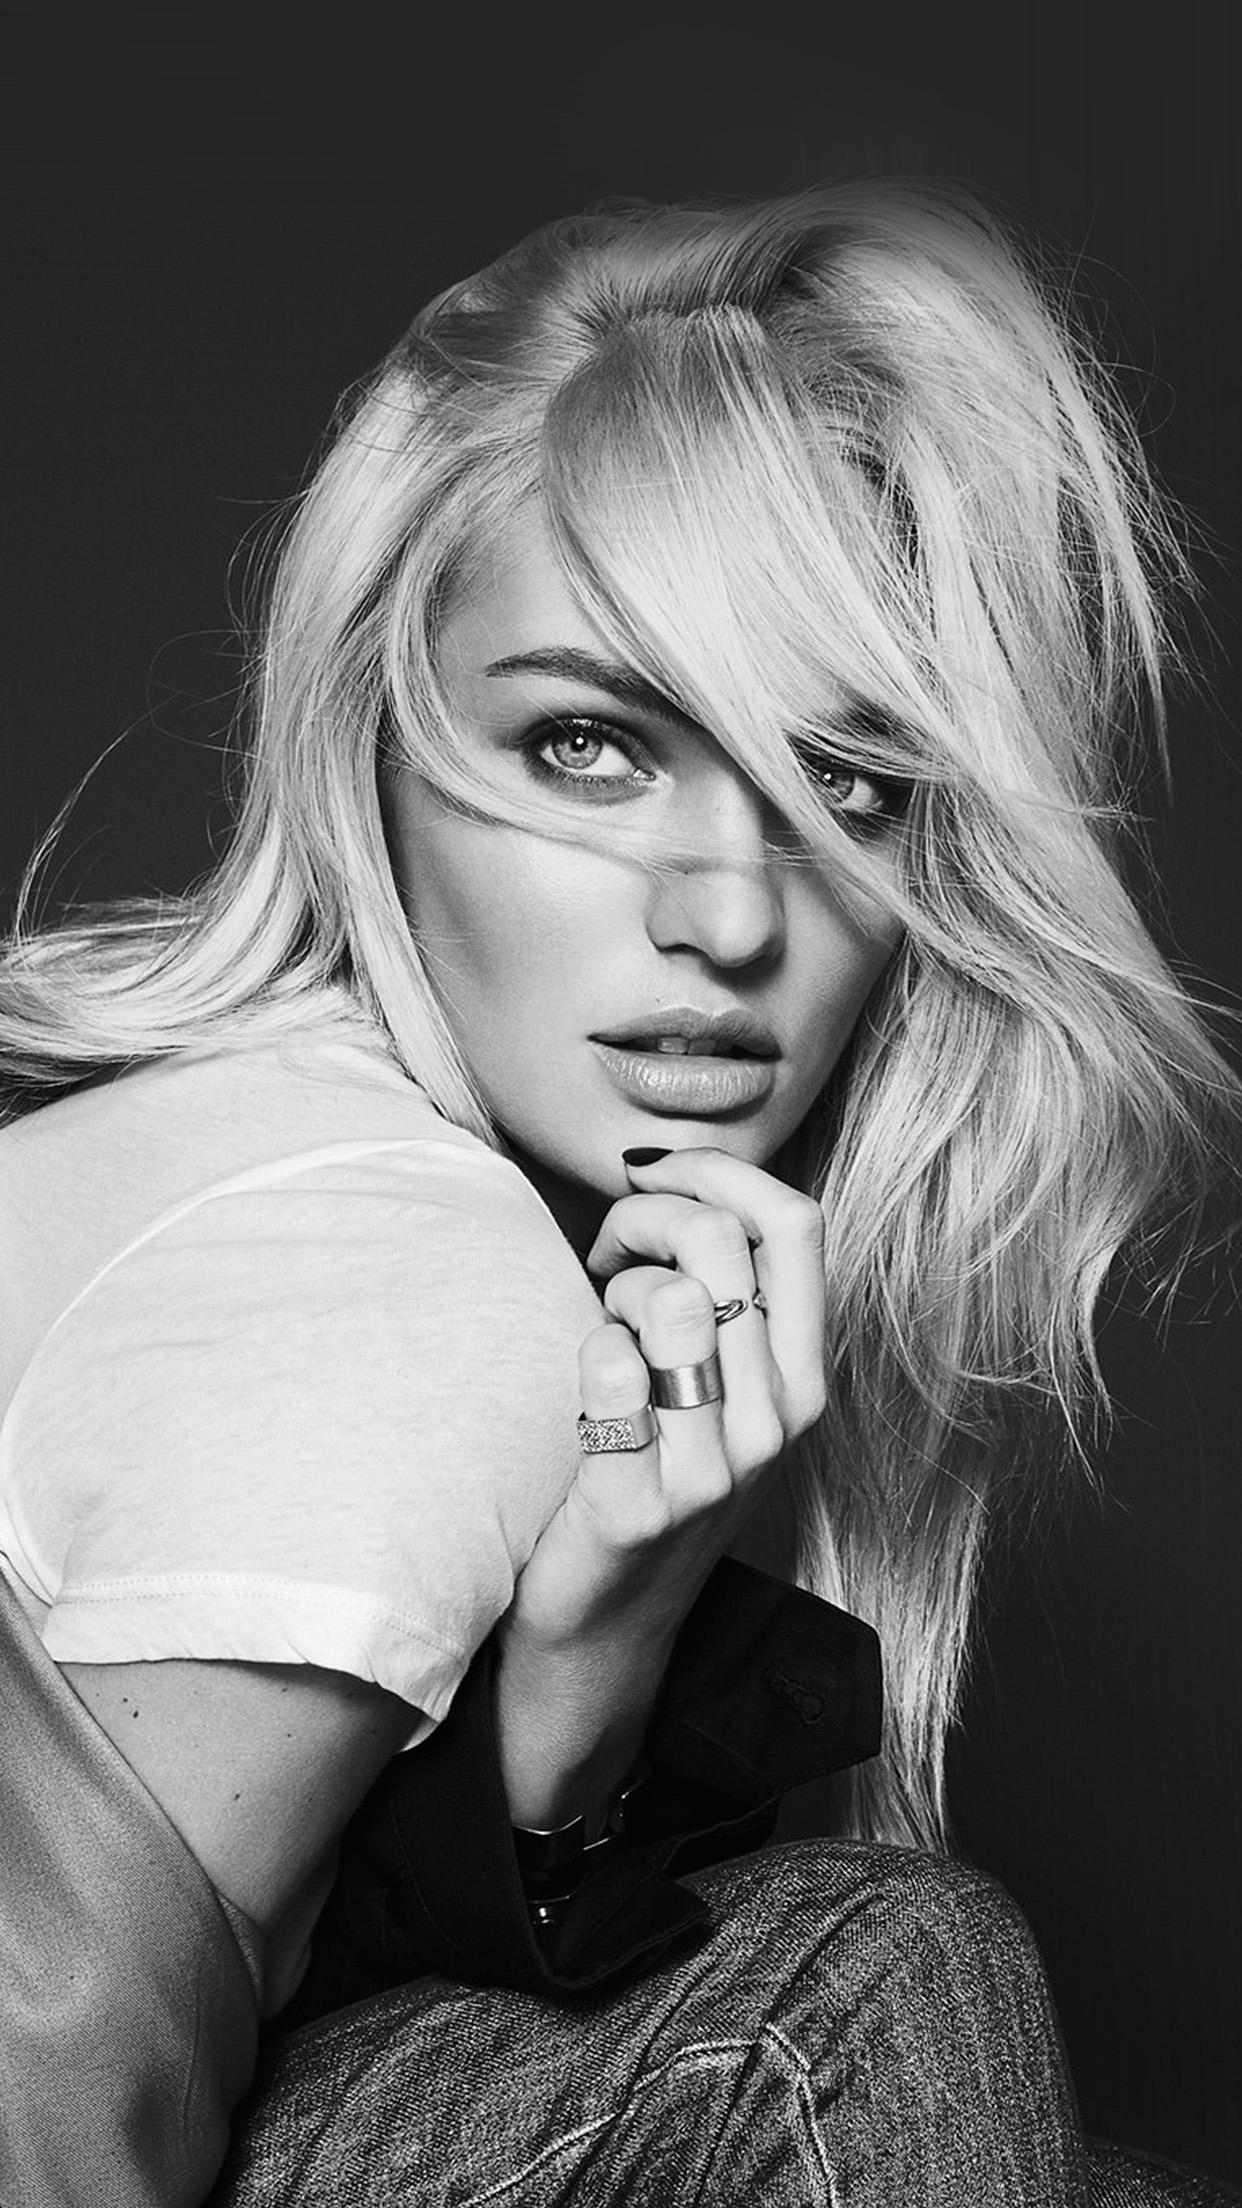 Hp68 Model Girl Candice Swanepoel Bw Wallpaper